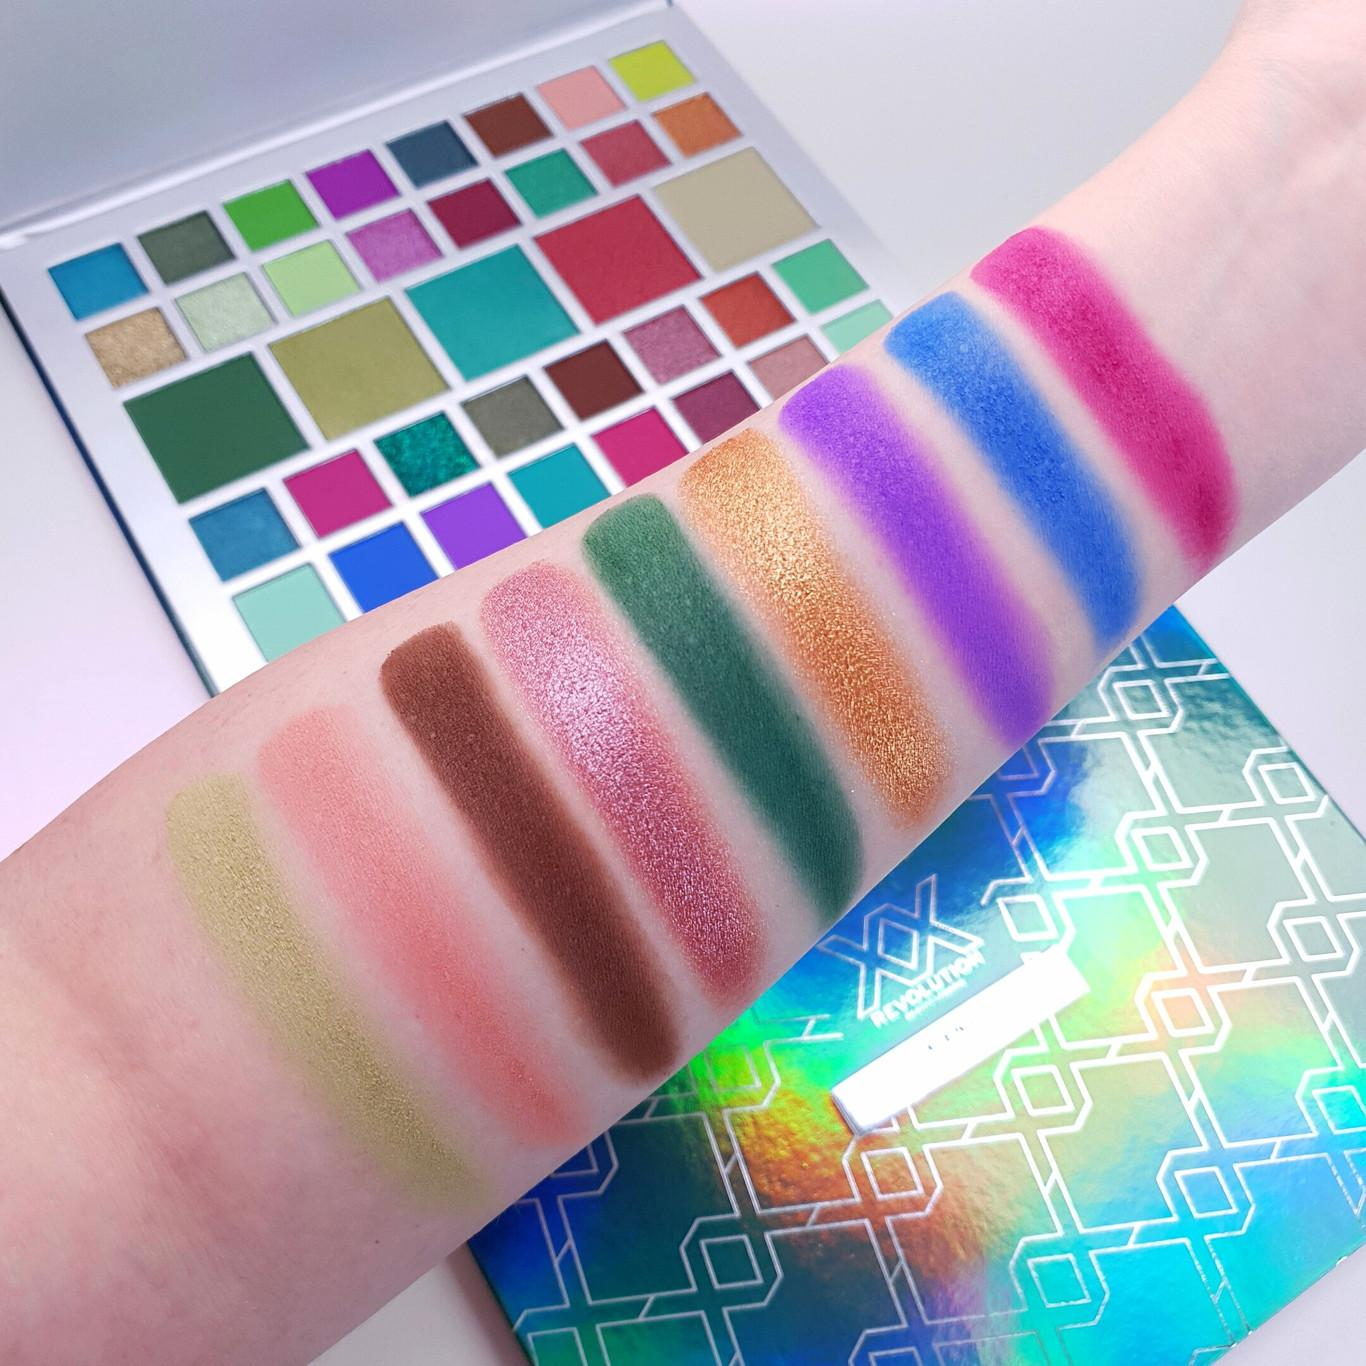 XX Revolution X Envy Eyeshadow Palette Light Arm Swatches